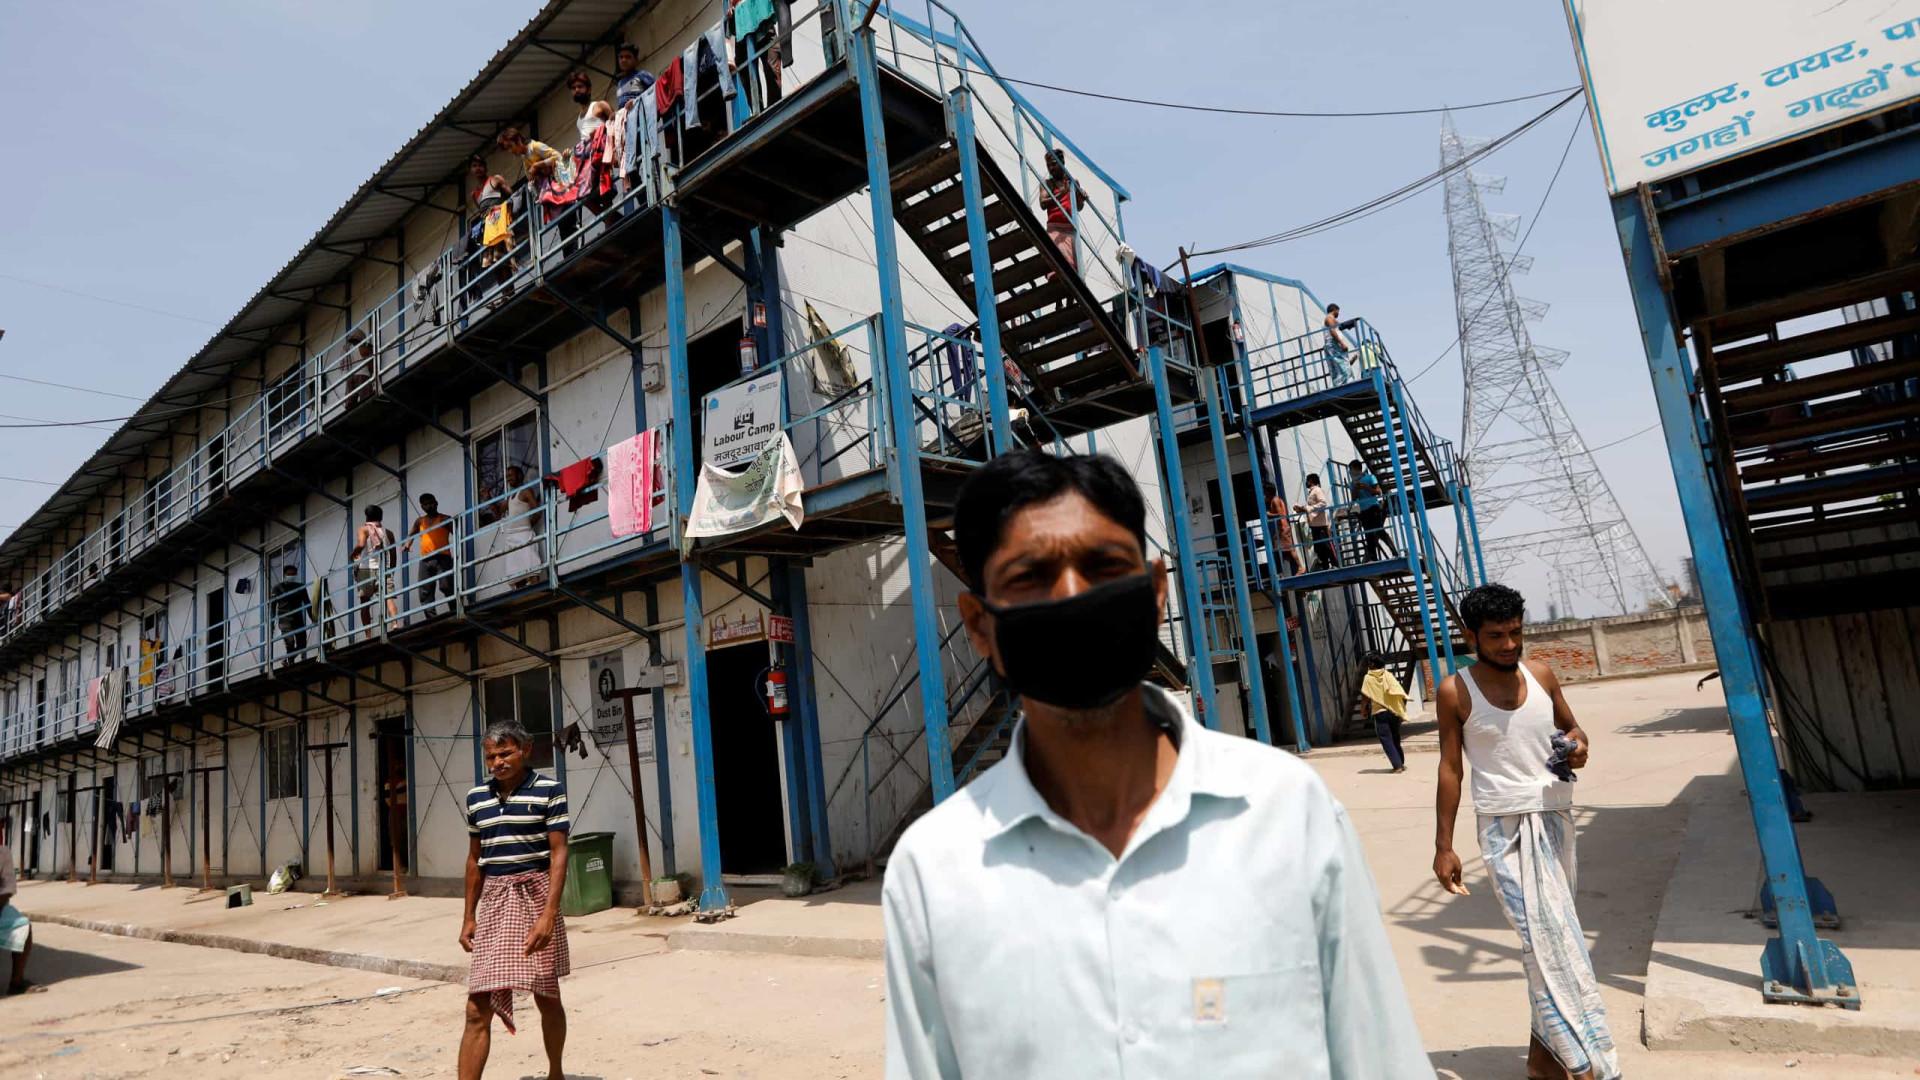 Covid-19: Índia ultrapassa 600 mil casos desde início da pandemia